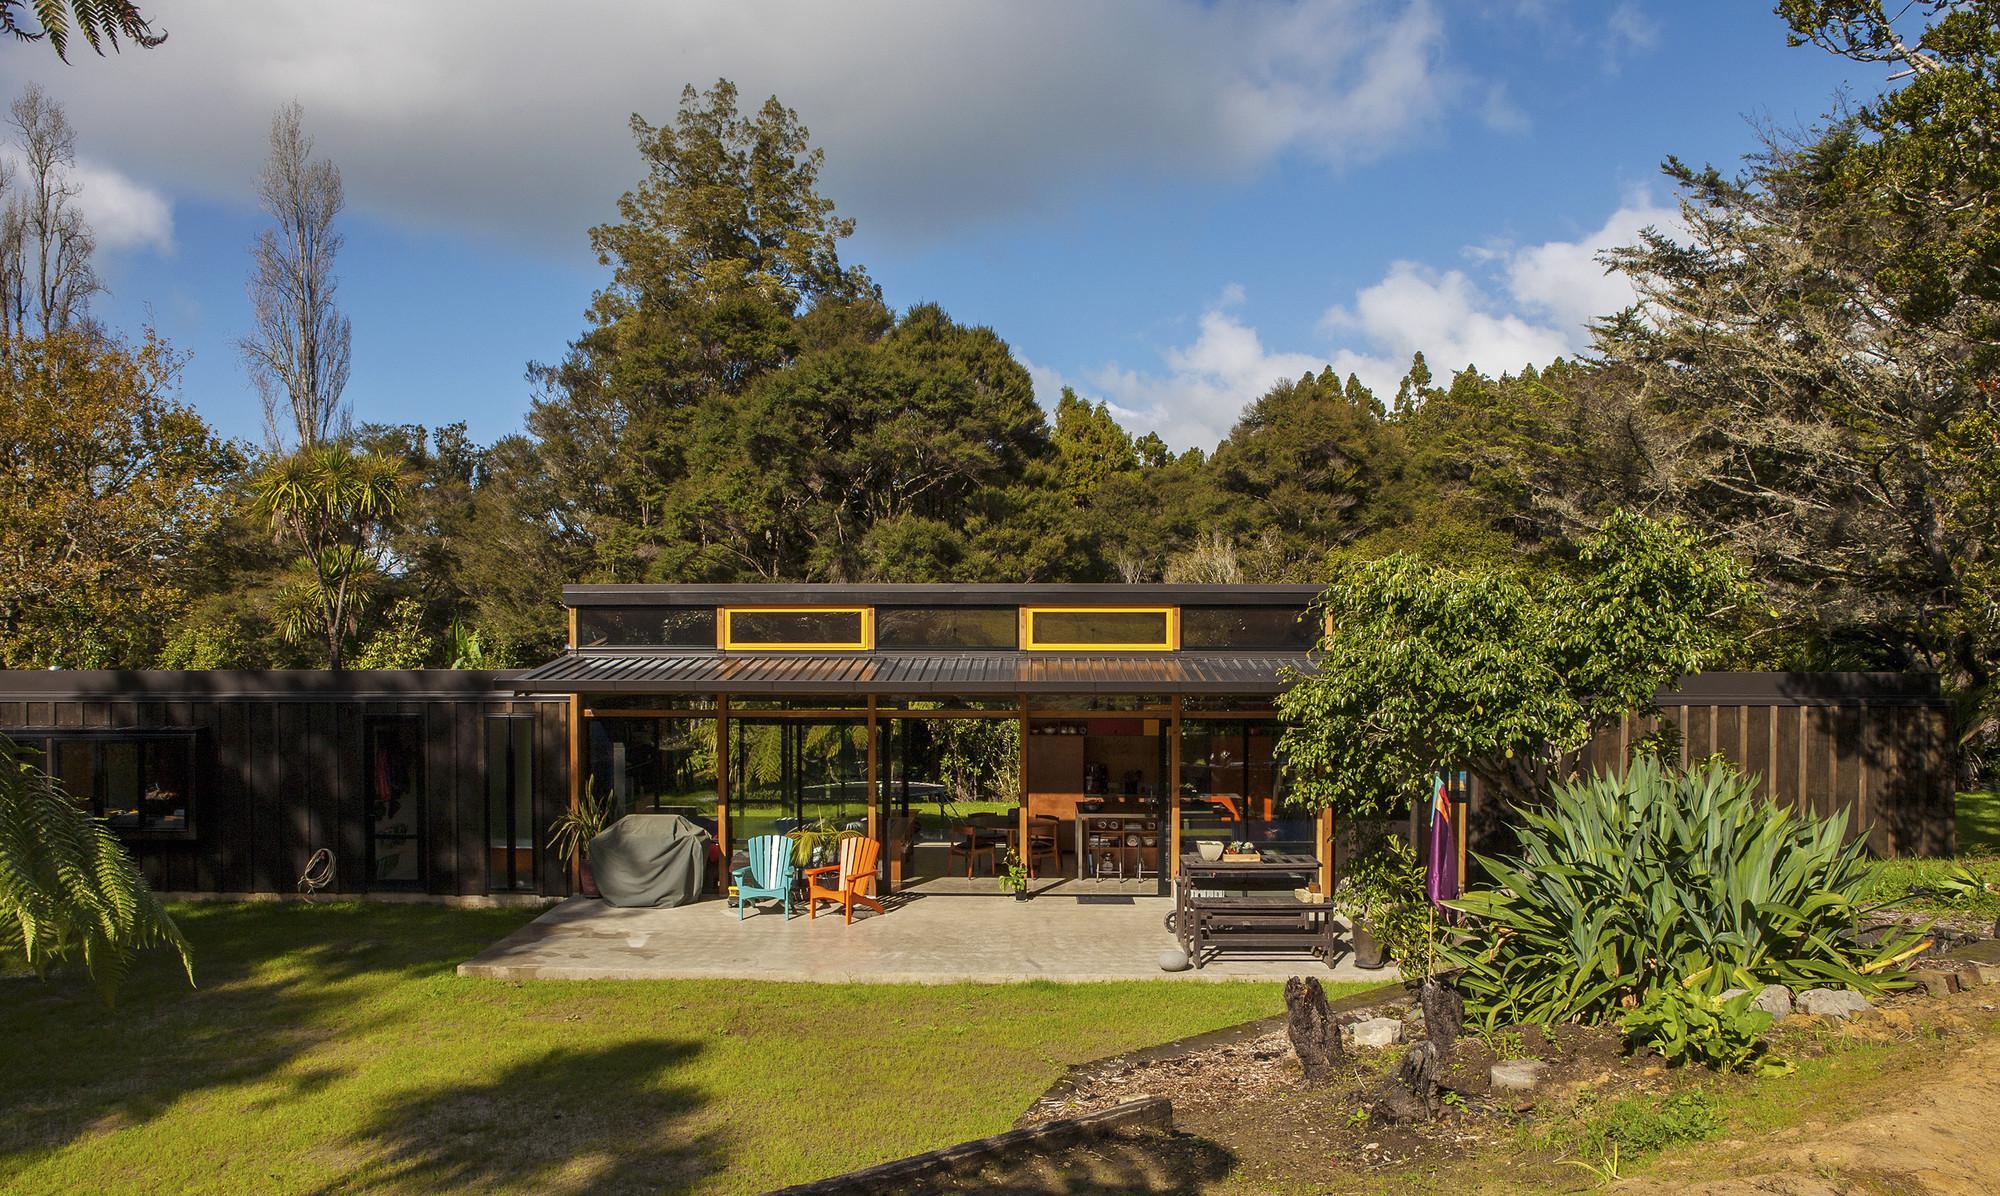 Easterbrook House / Dorrington Atcheson Architects, © Emma-Jane Hetherington